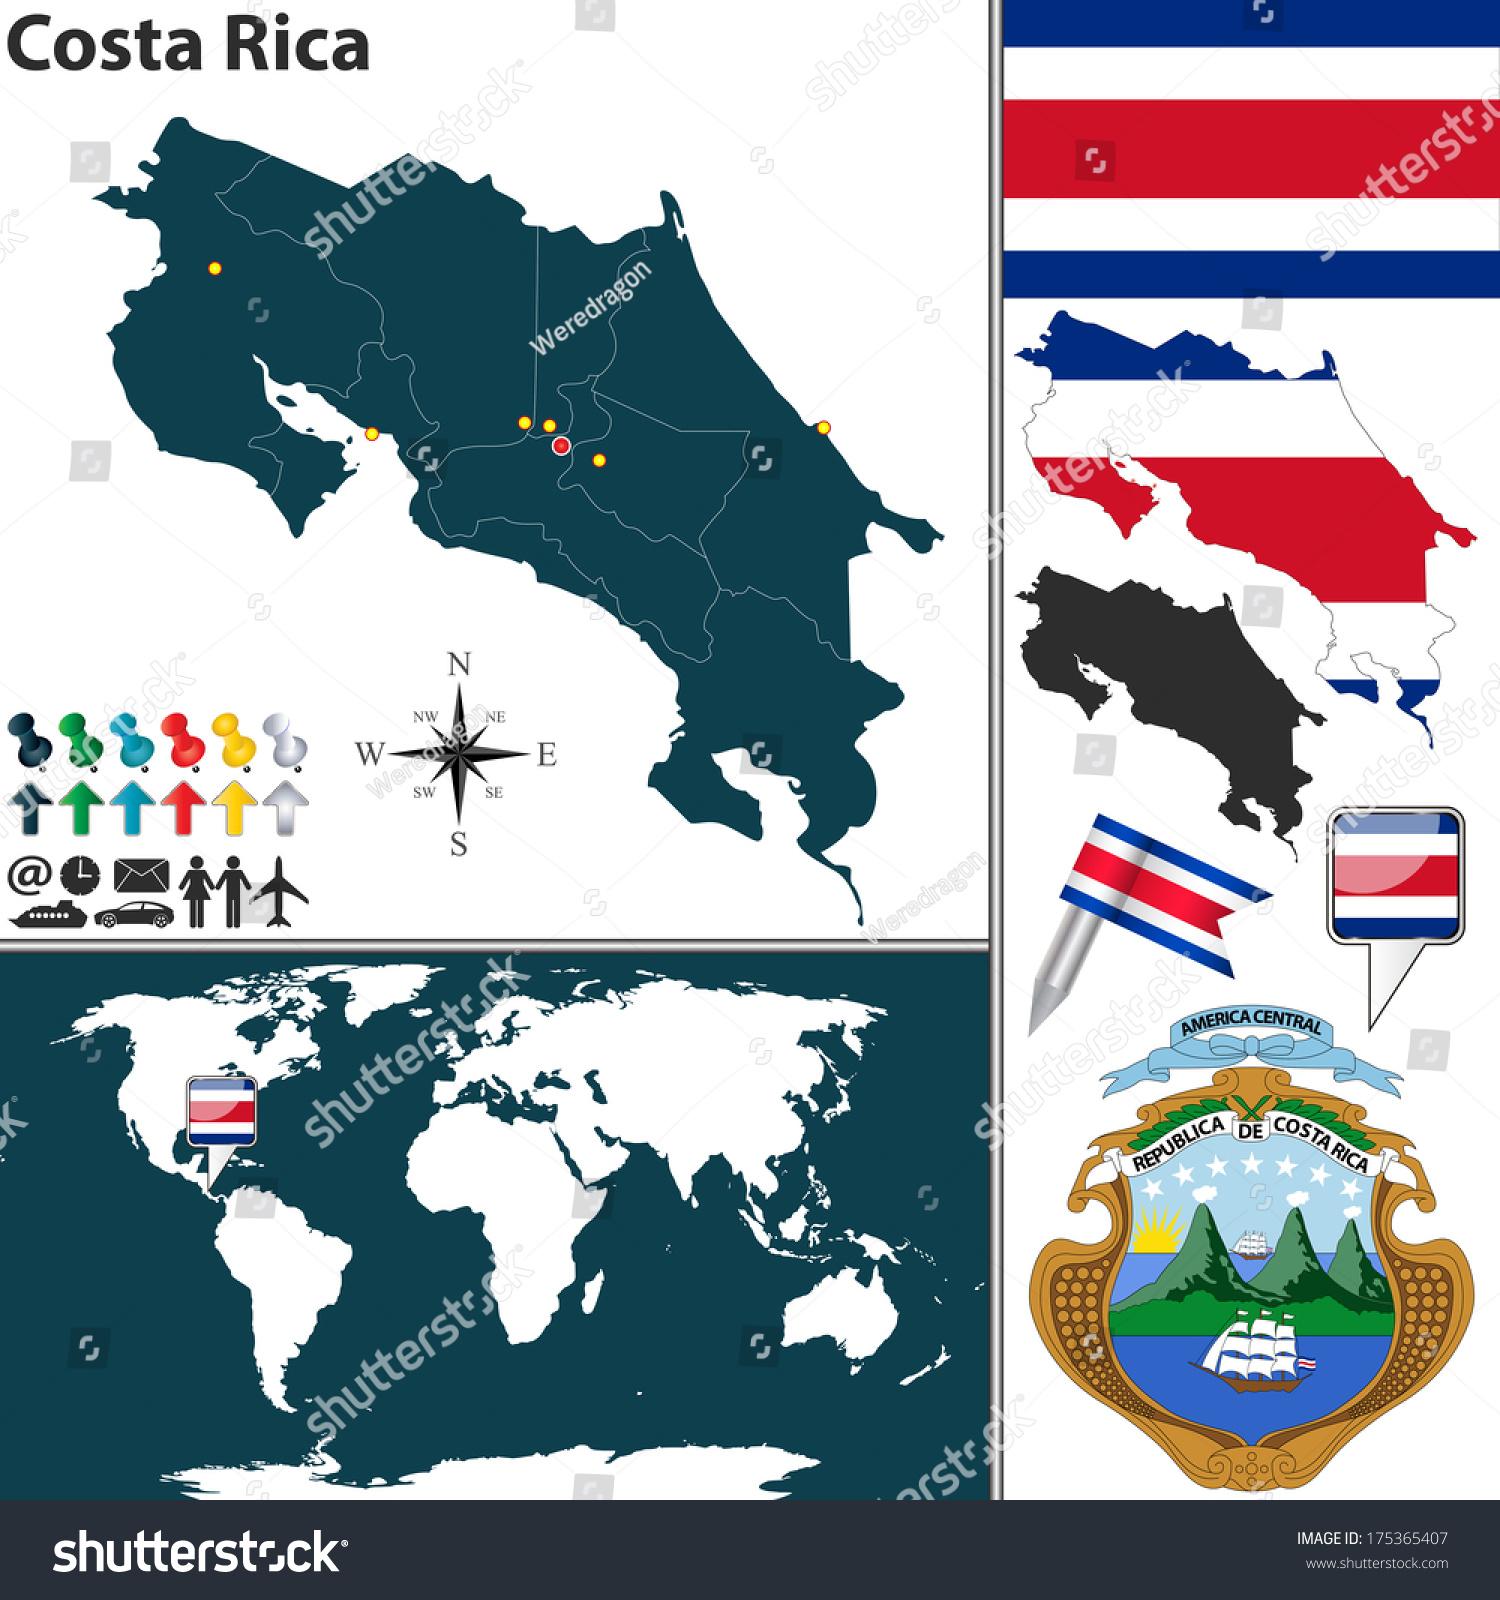 Image of: Vector De Stock Libre De Regalias Sobre Vector Map Costa Rica Regions Coat175365407